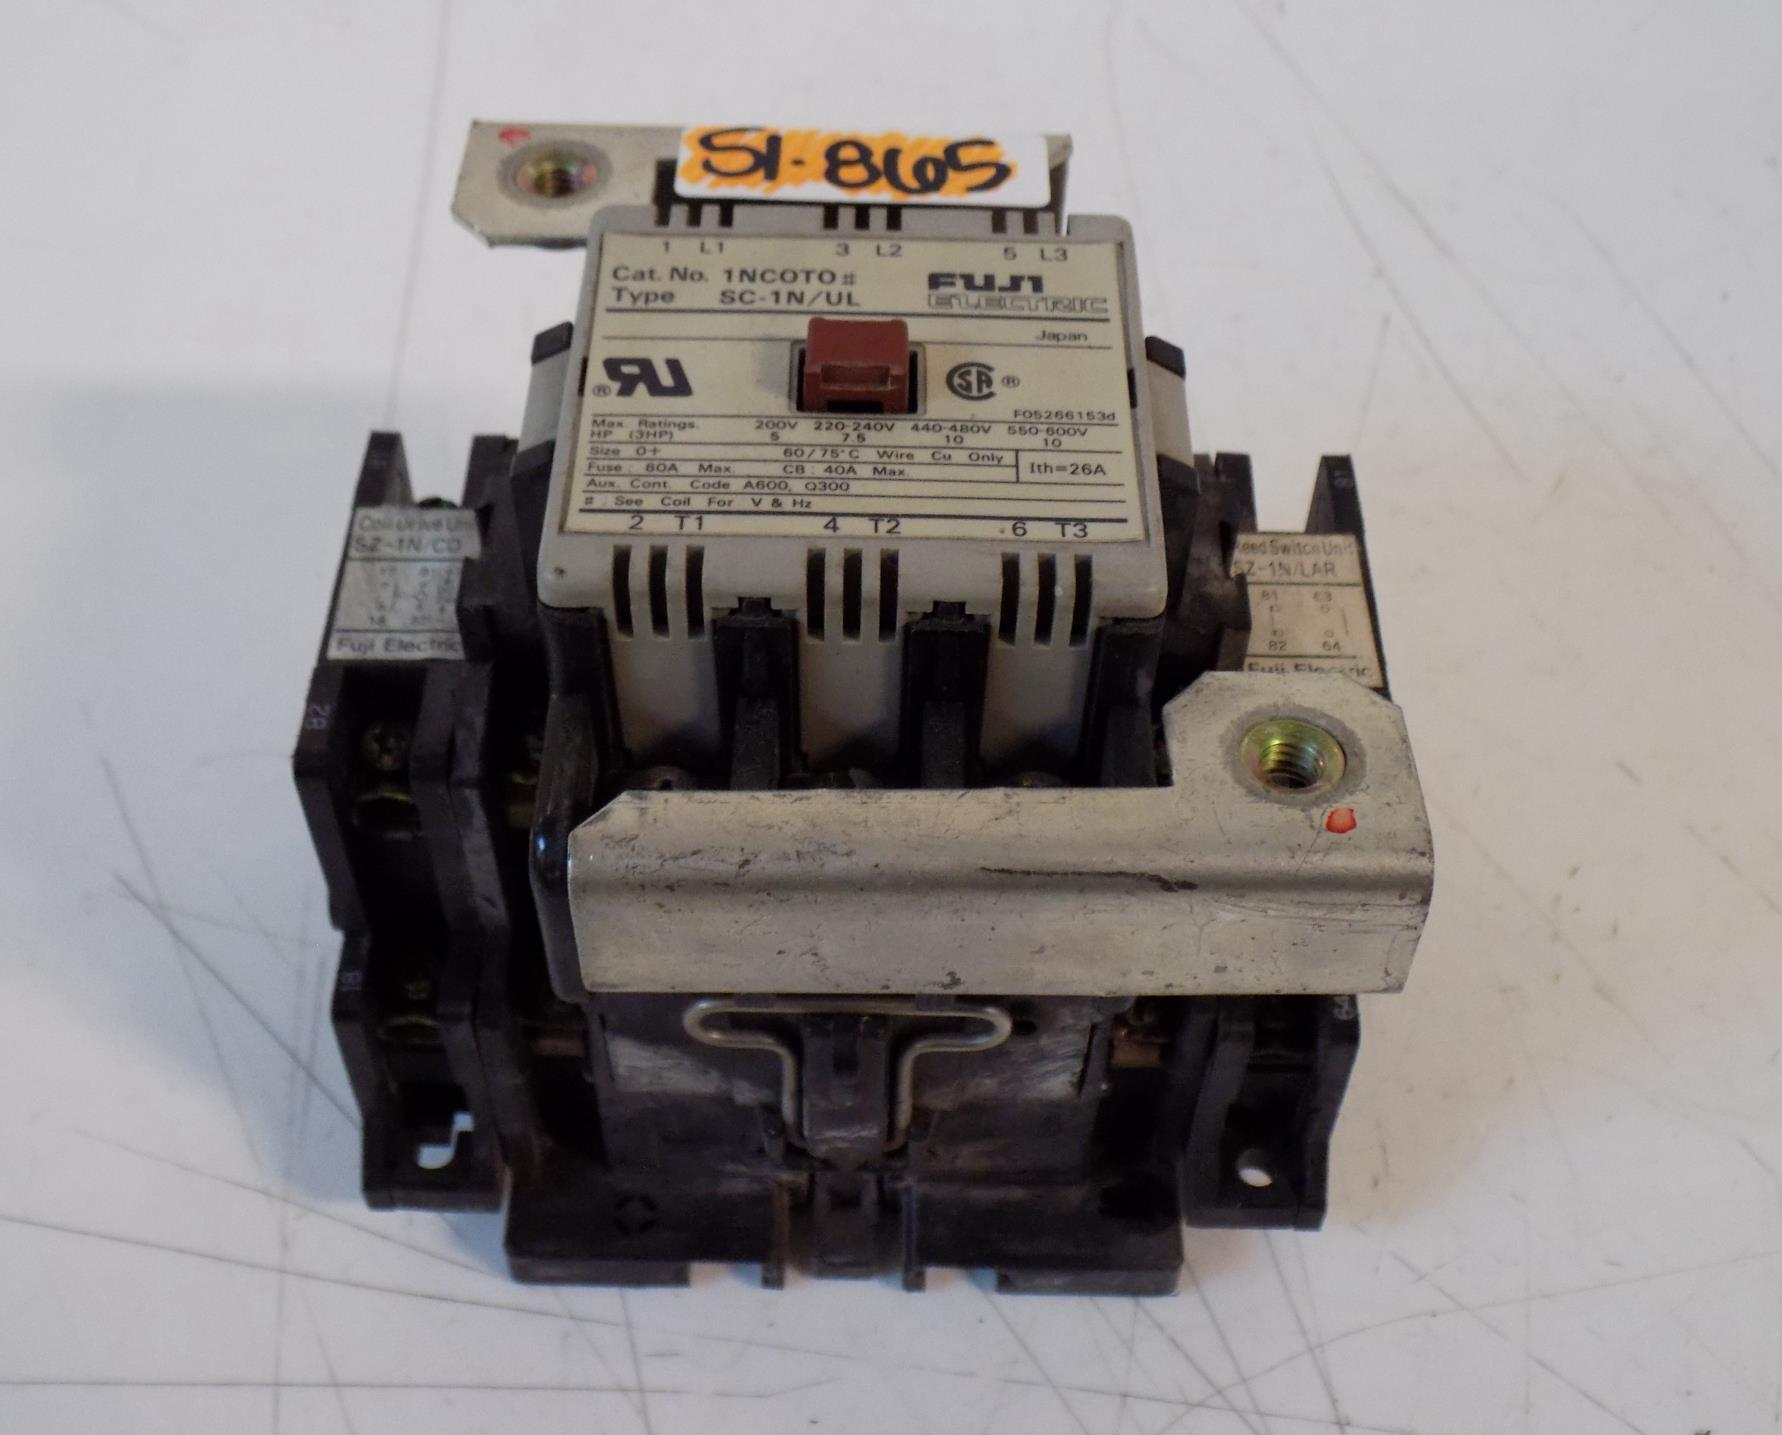 Fuji SC-1N Fuji Electric Contactor Type SC-1N